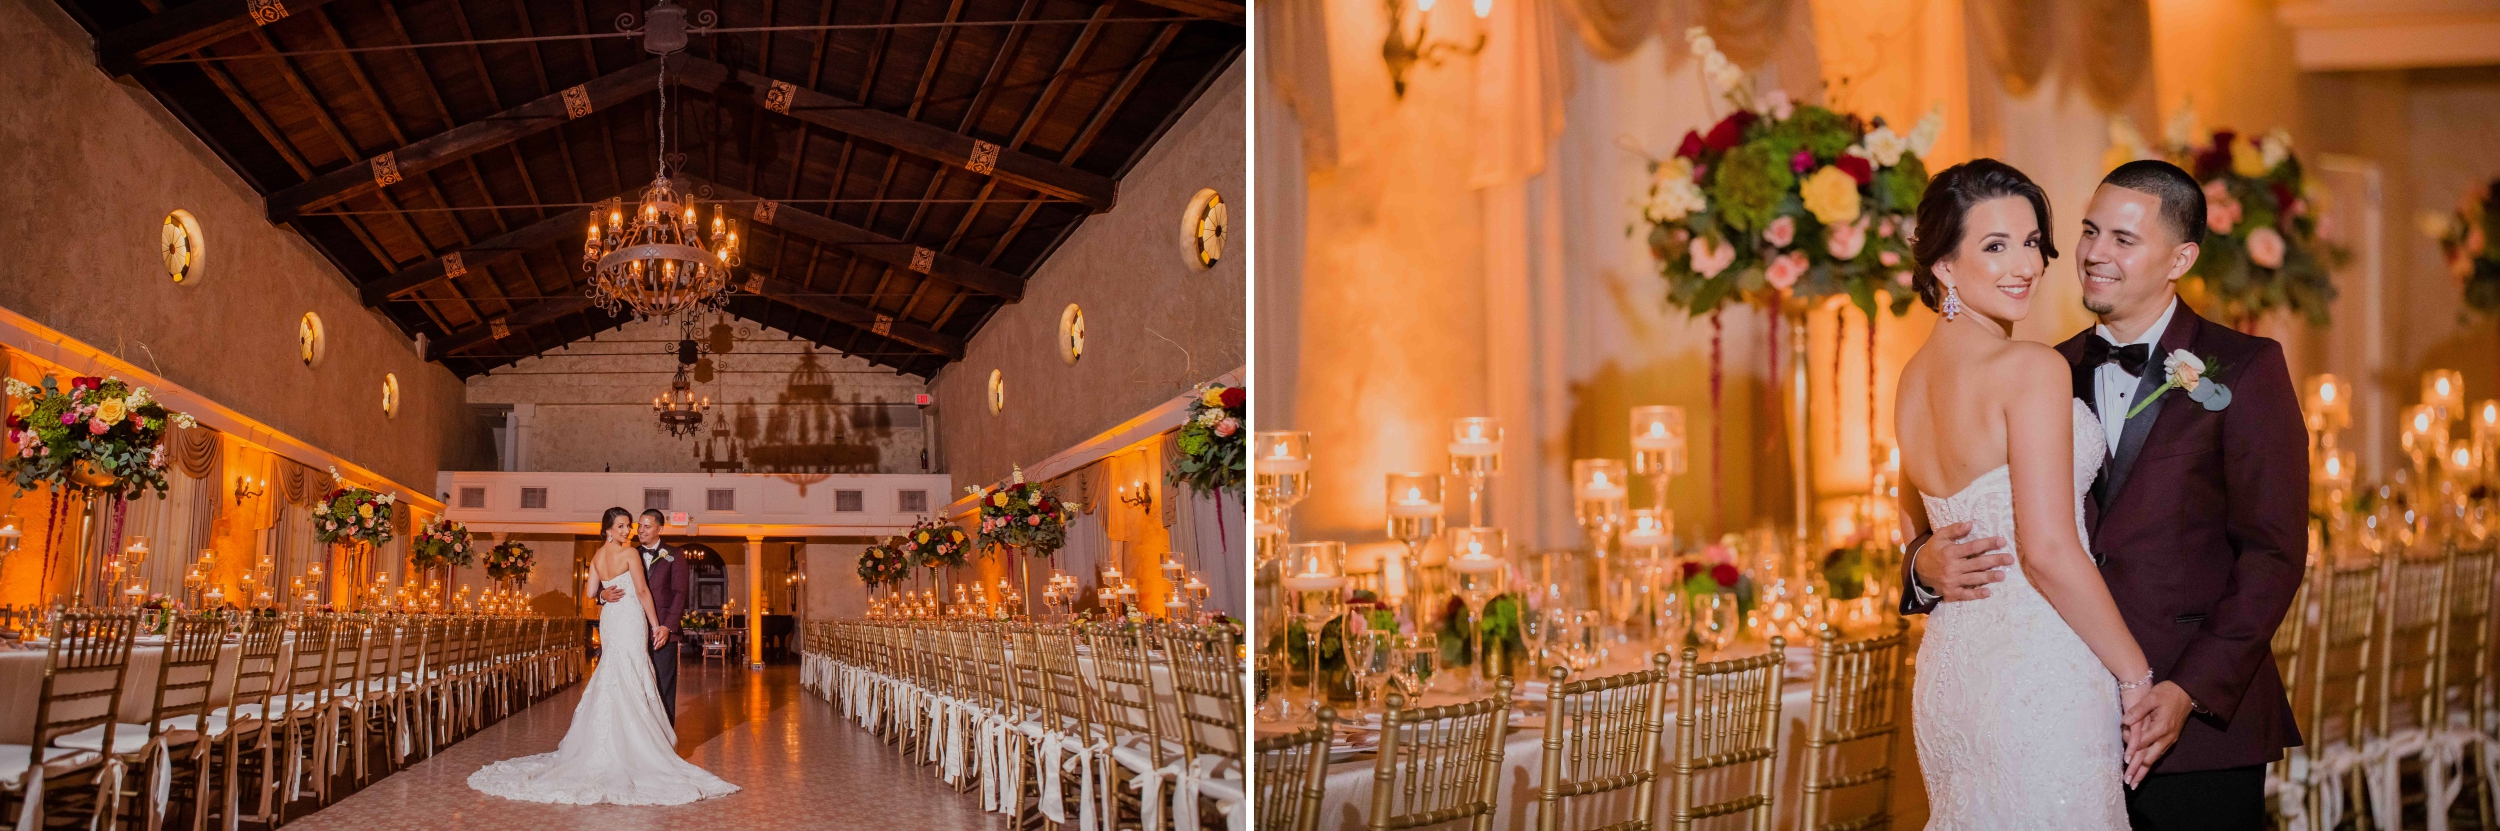 Wedding - Coco Plum - Coral Gables Congregational - Santy Martinez Photography 30.jpg